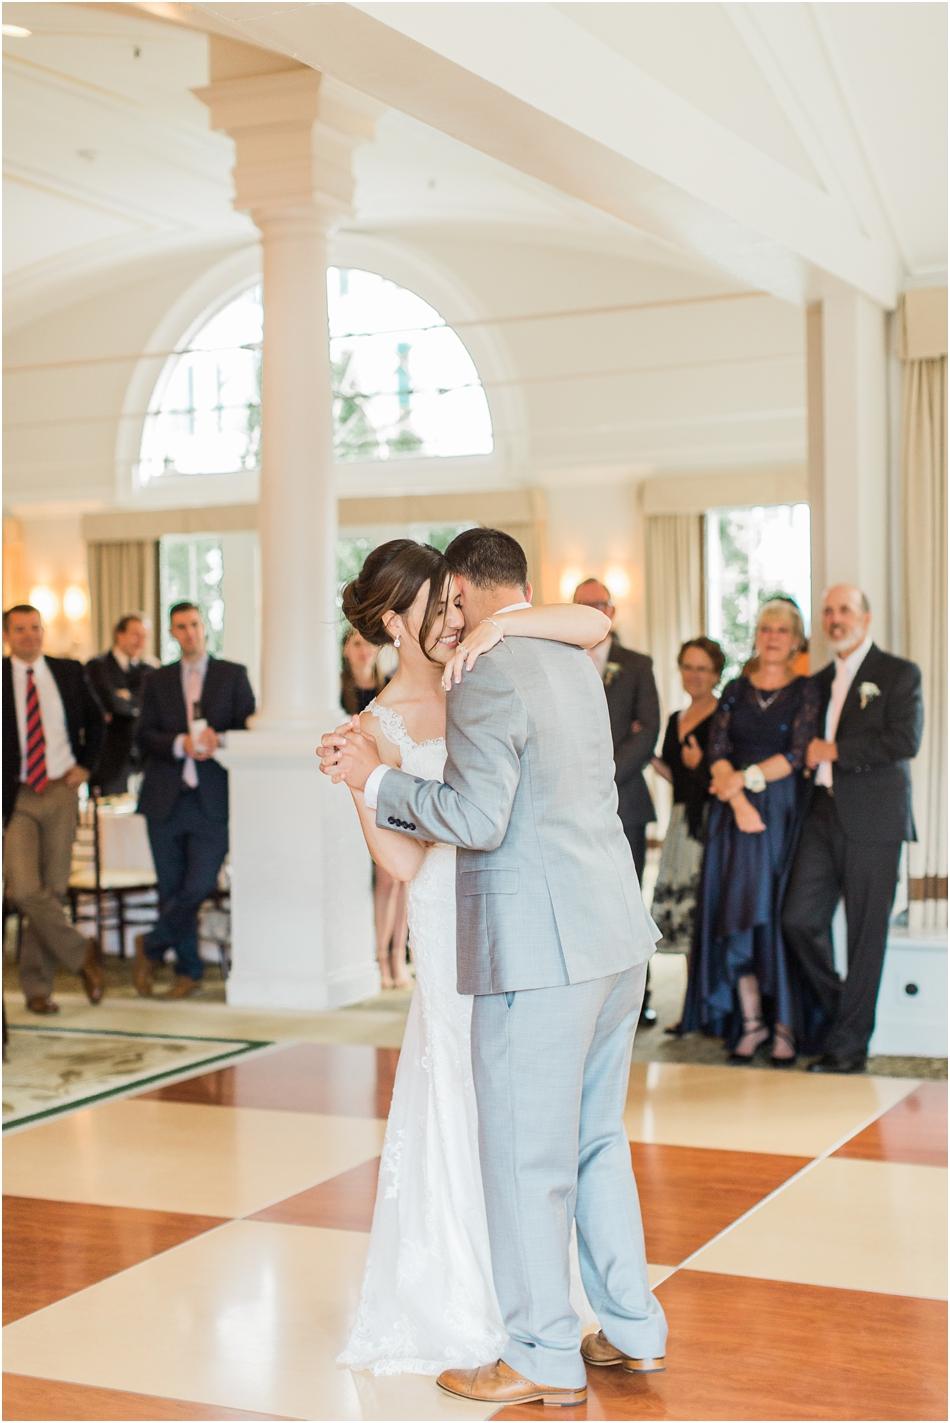 equinox_resort_golf_club_manchester_vermont_jennifer_matt_cape_cod_boston_new_england_wedding_photographer_Meredith_Jane_Photography_photo_2396.jpg